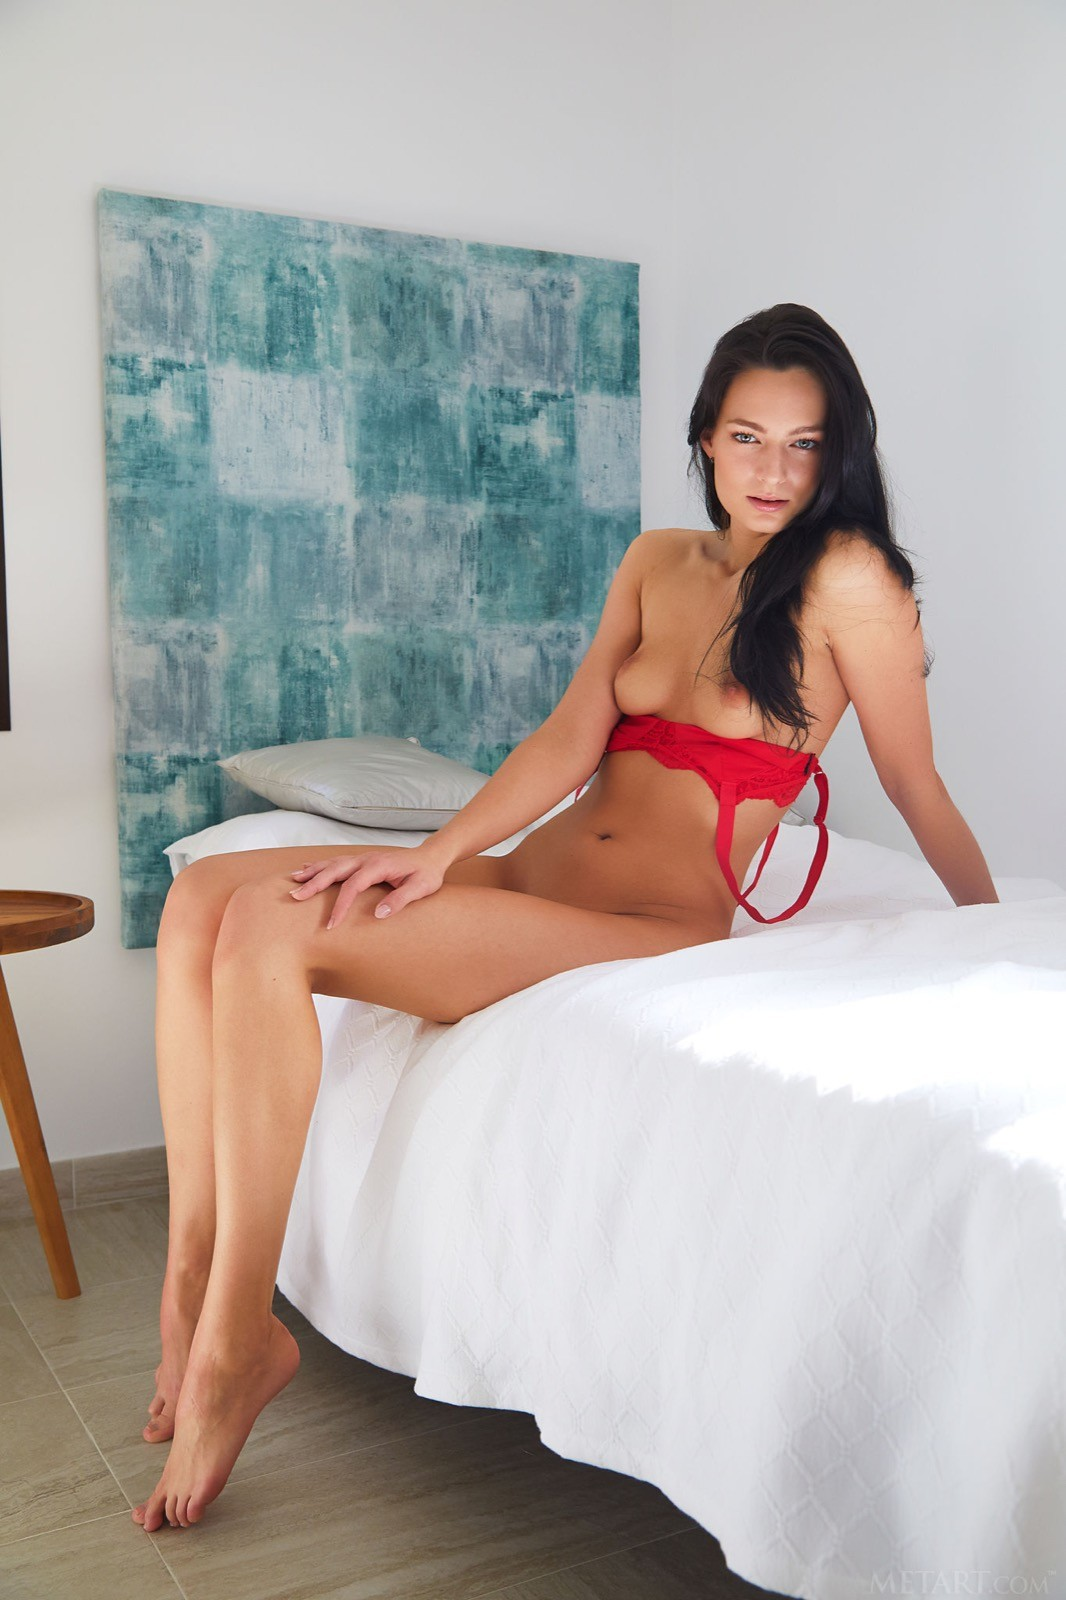 Брюнетка в красном белье на кровати - фото